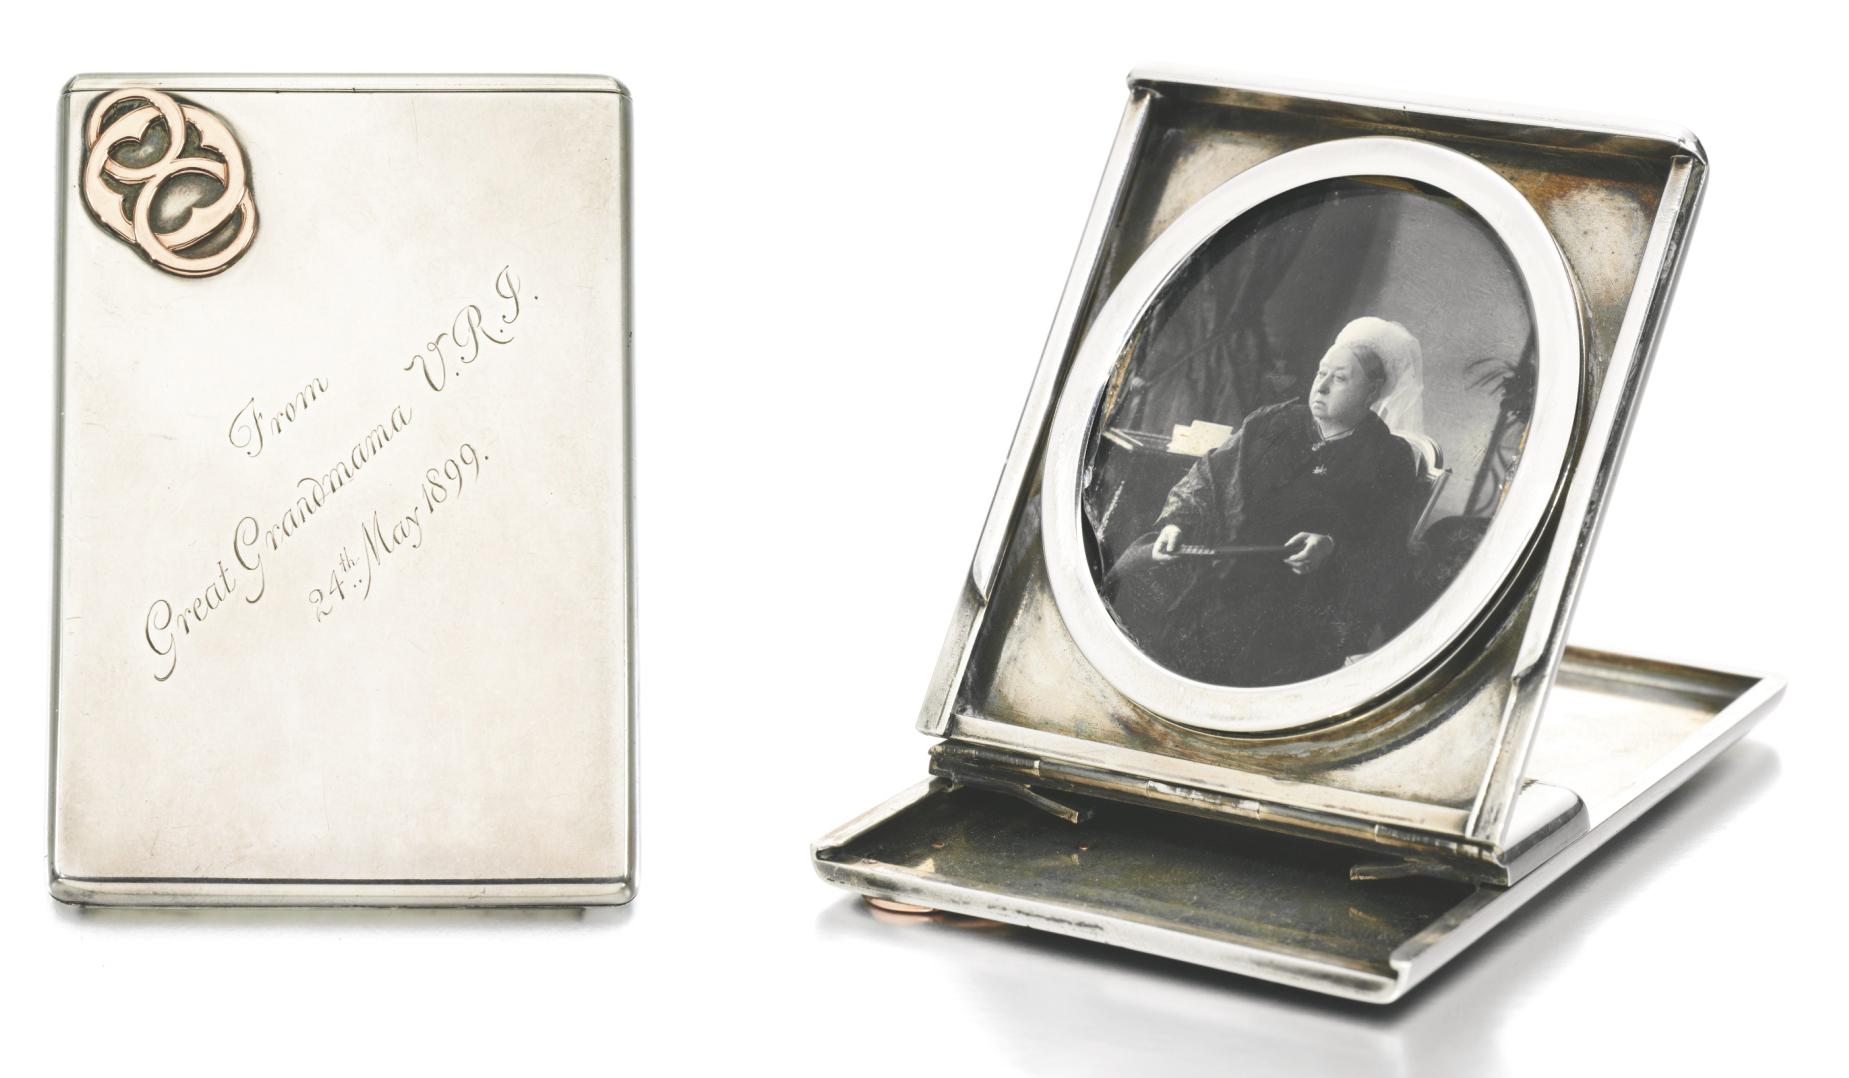 Queen Victoria Autograph